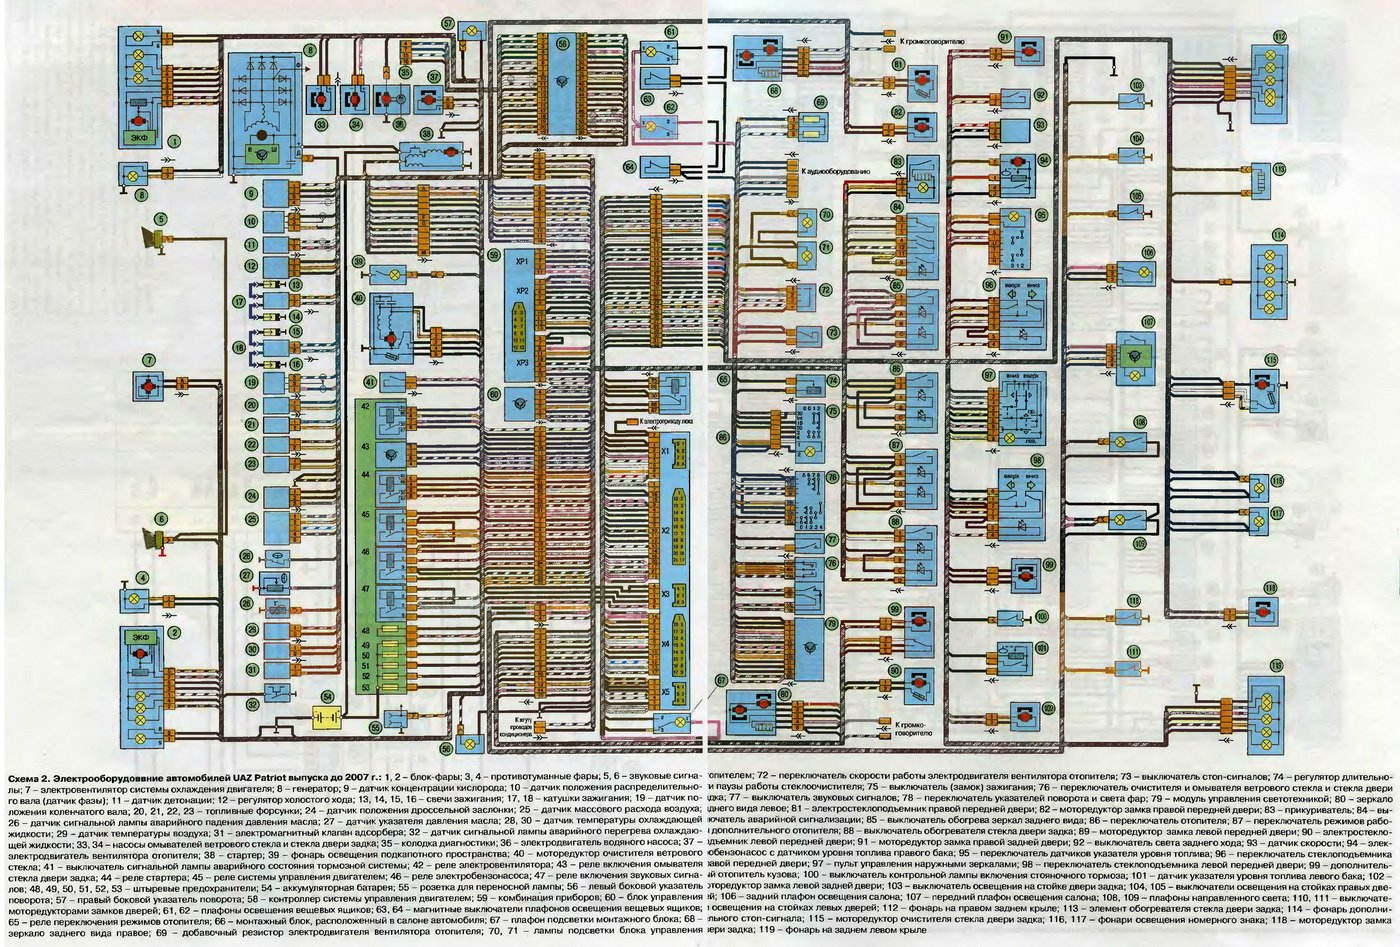 электросхема ваз 2110 карбюратор 1998 года